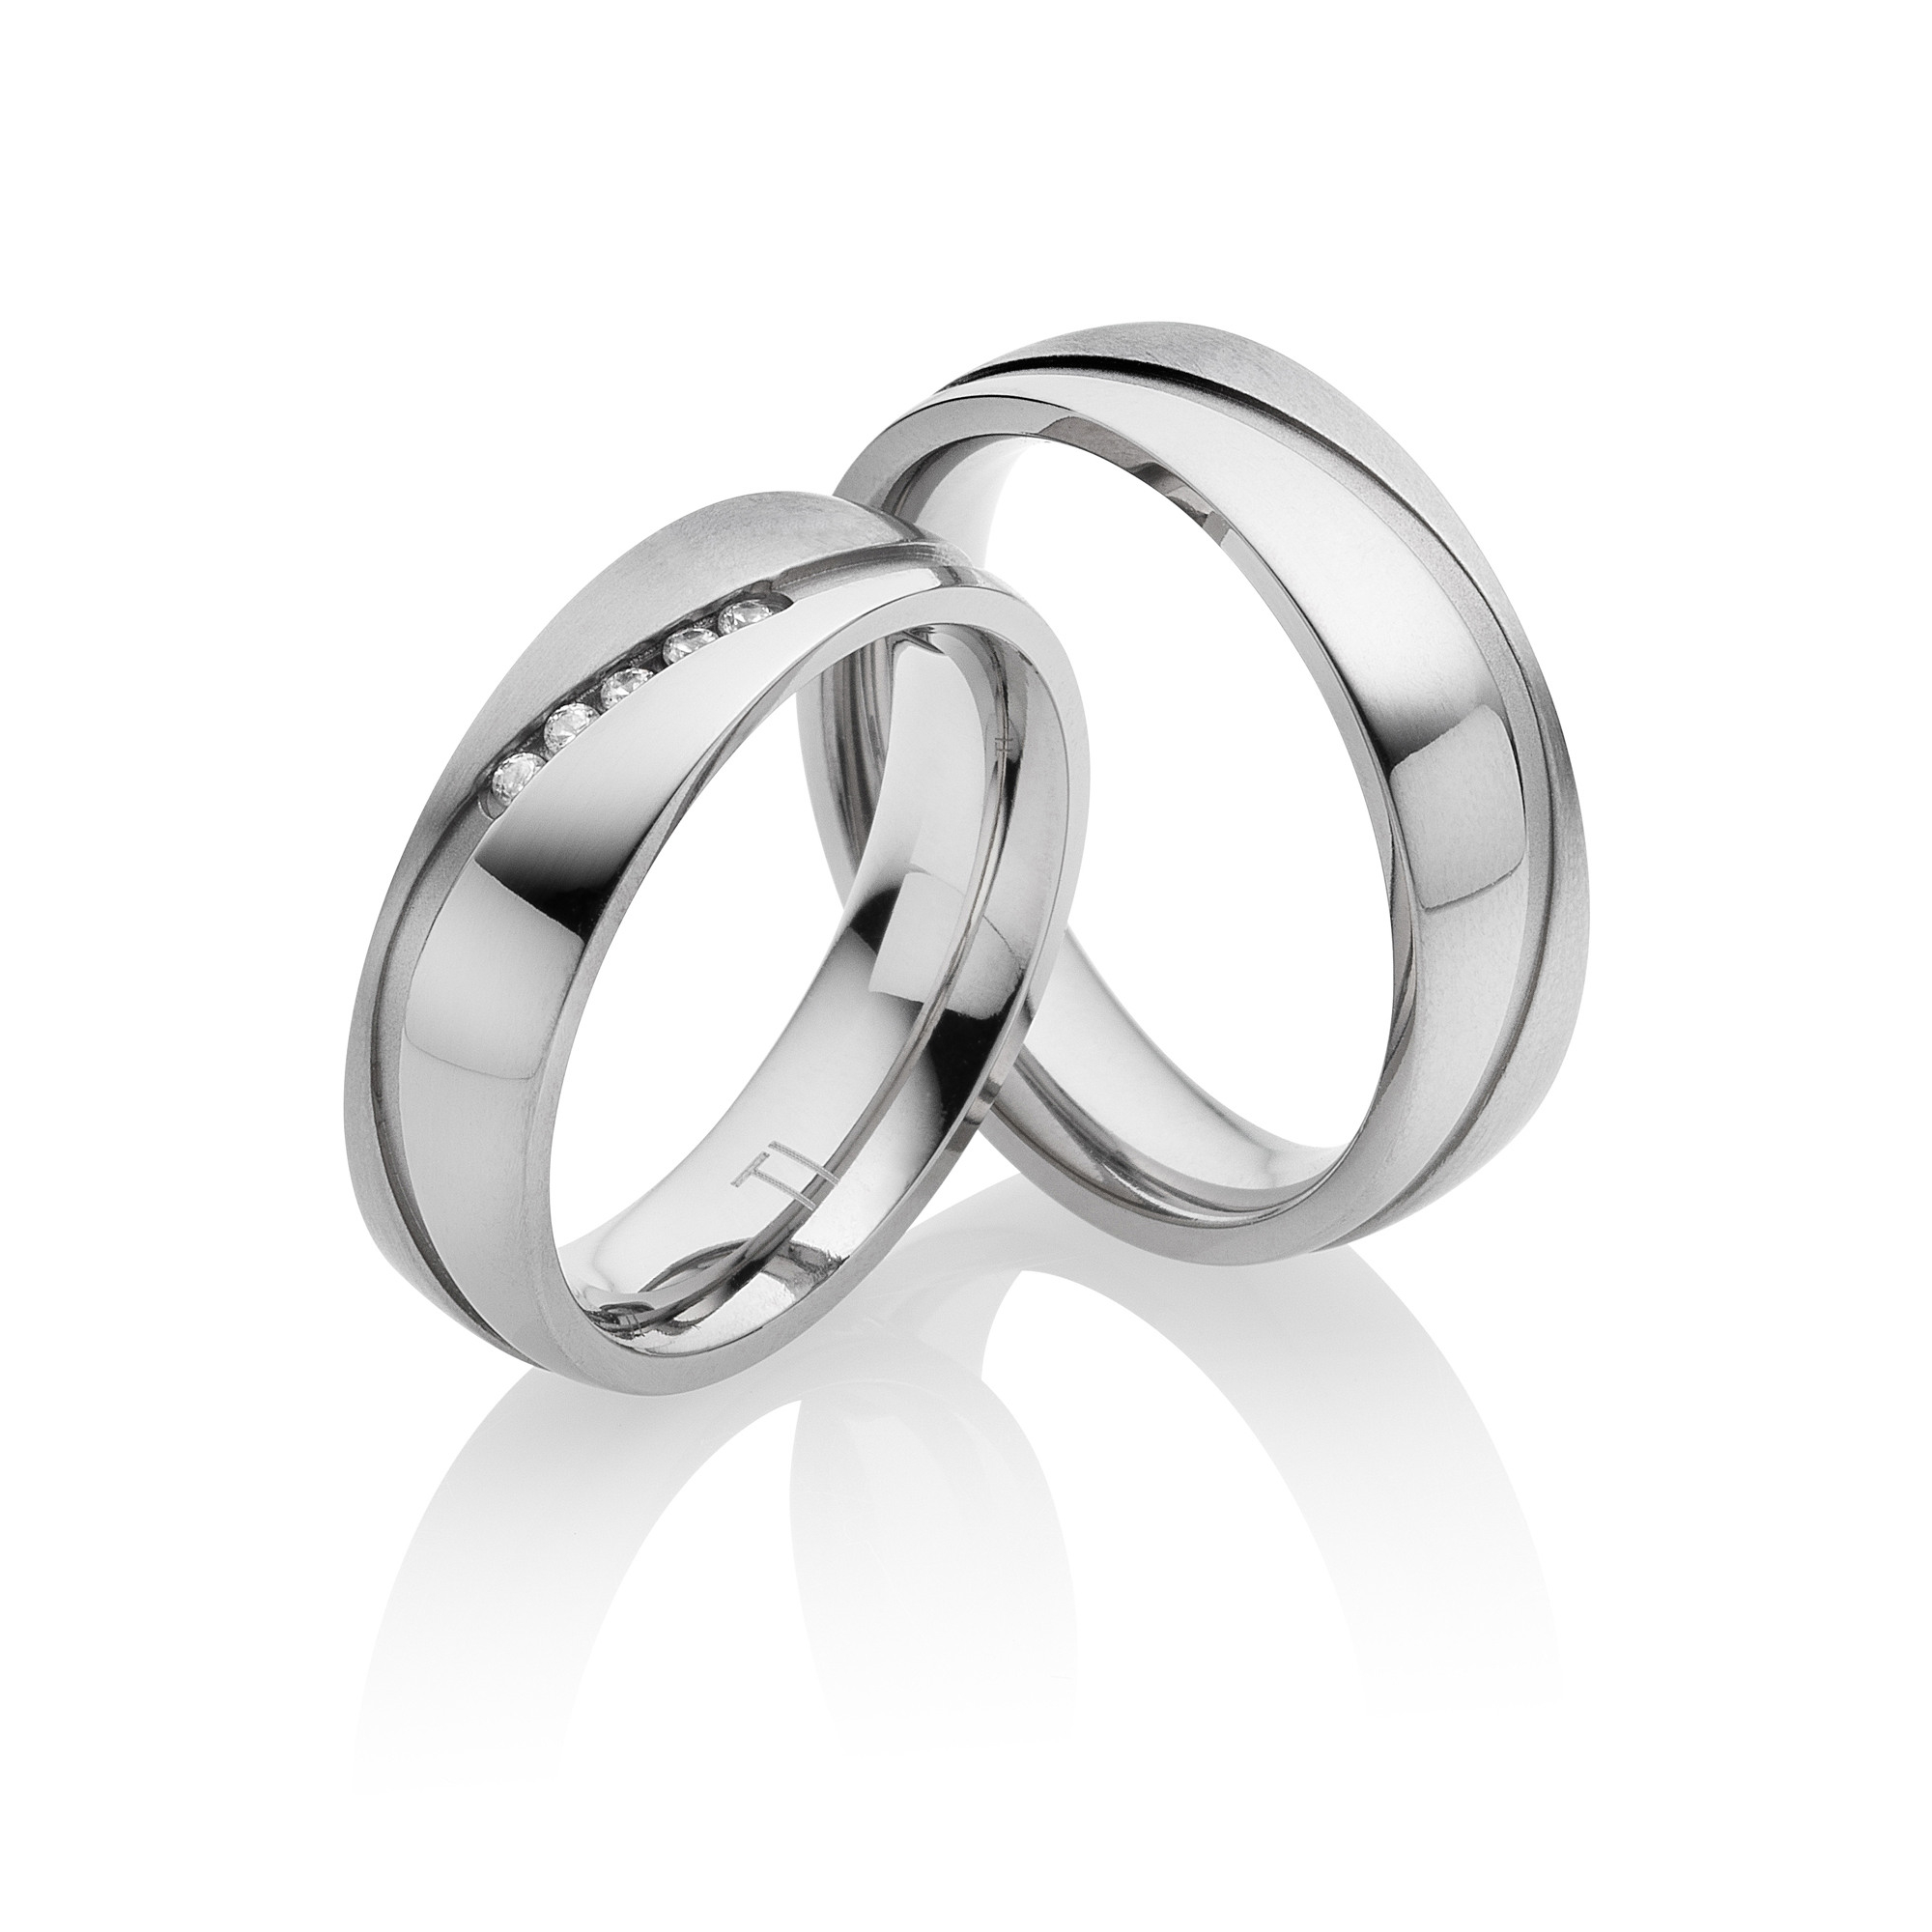 Titan Eheringe Partnerringe Sevilla | Miomi - Tungsten Carbide Jewelry